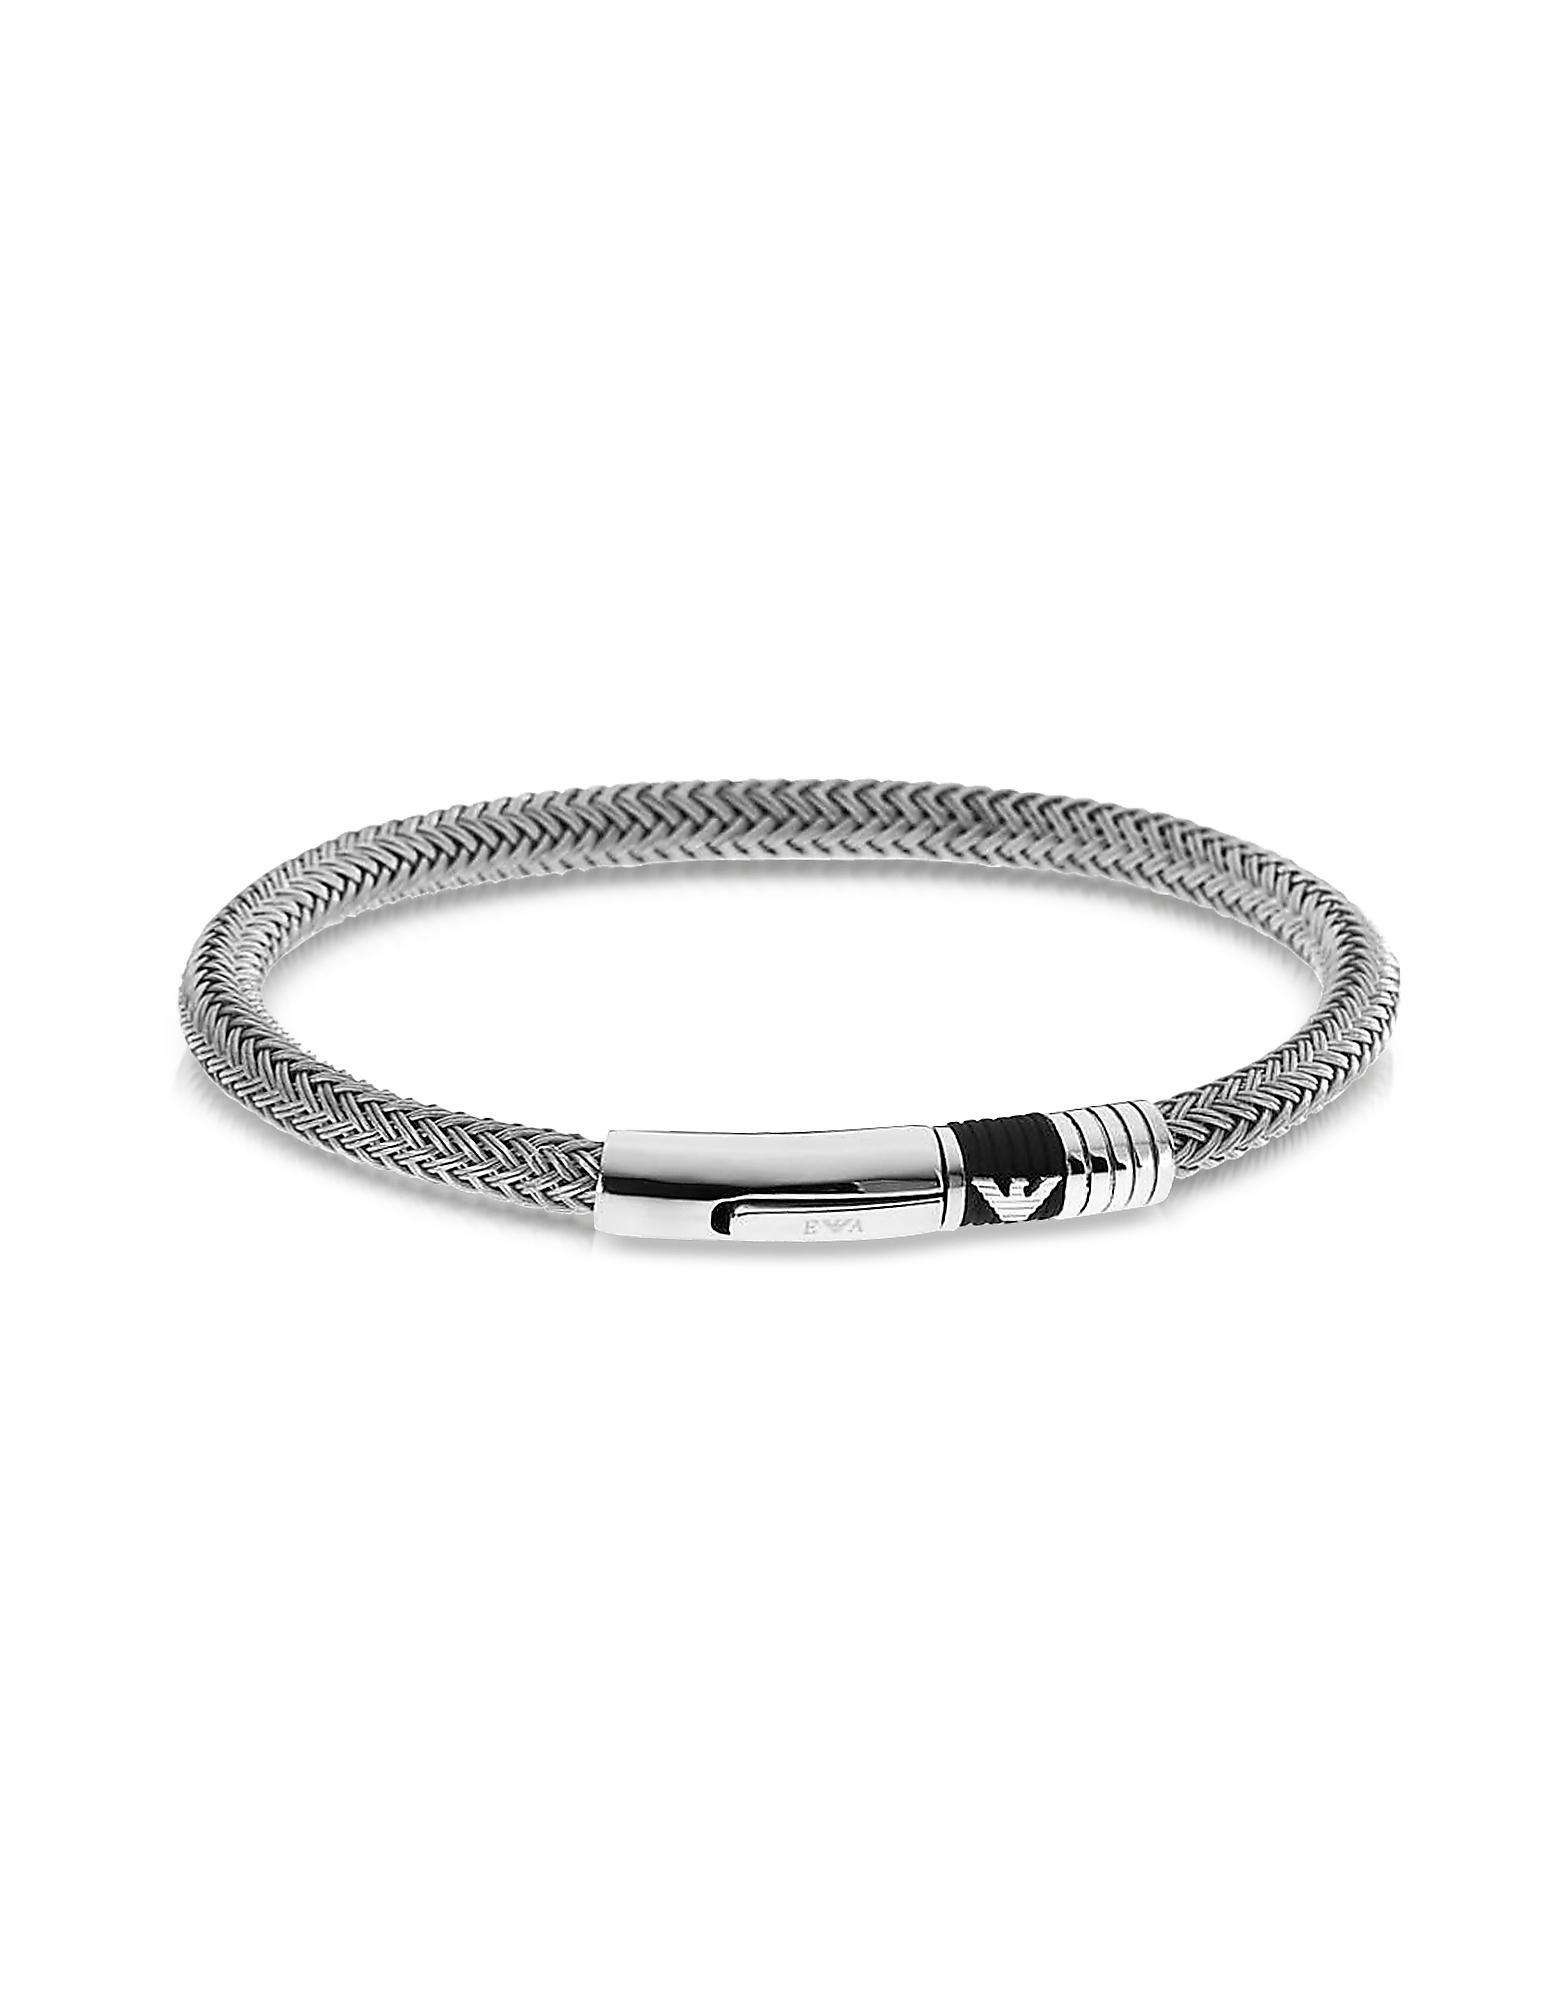 Emporio Armani Metallic Iconic Woven Stainless Steel Men S Bracelet